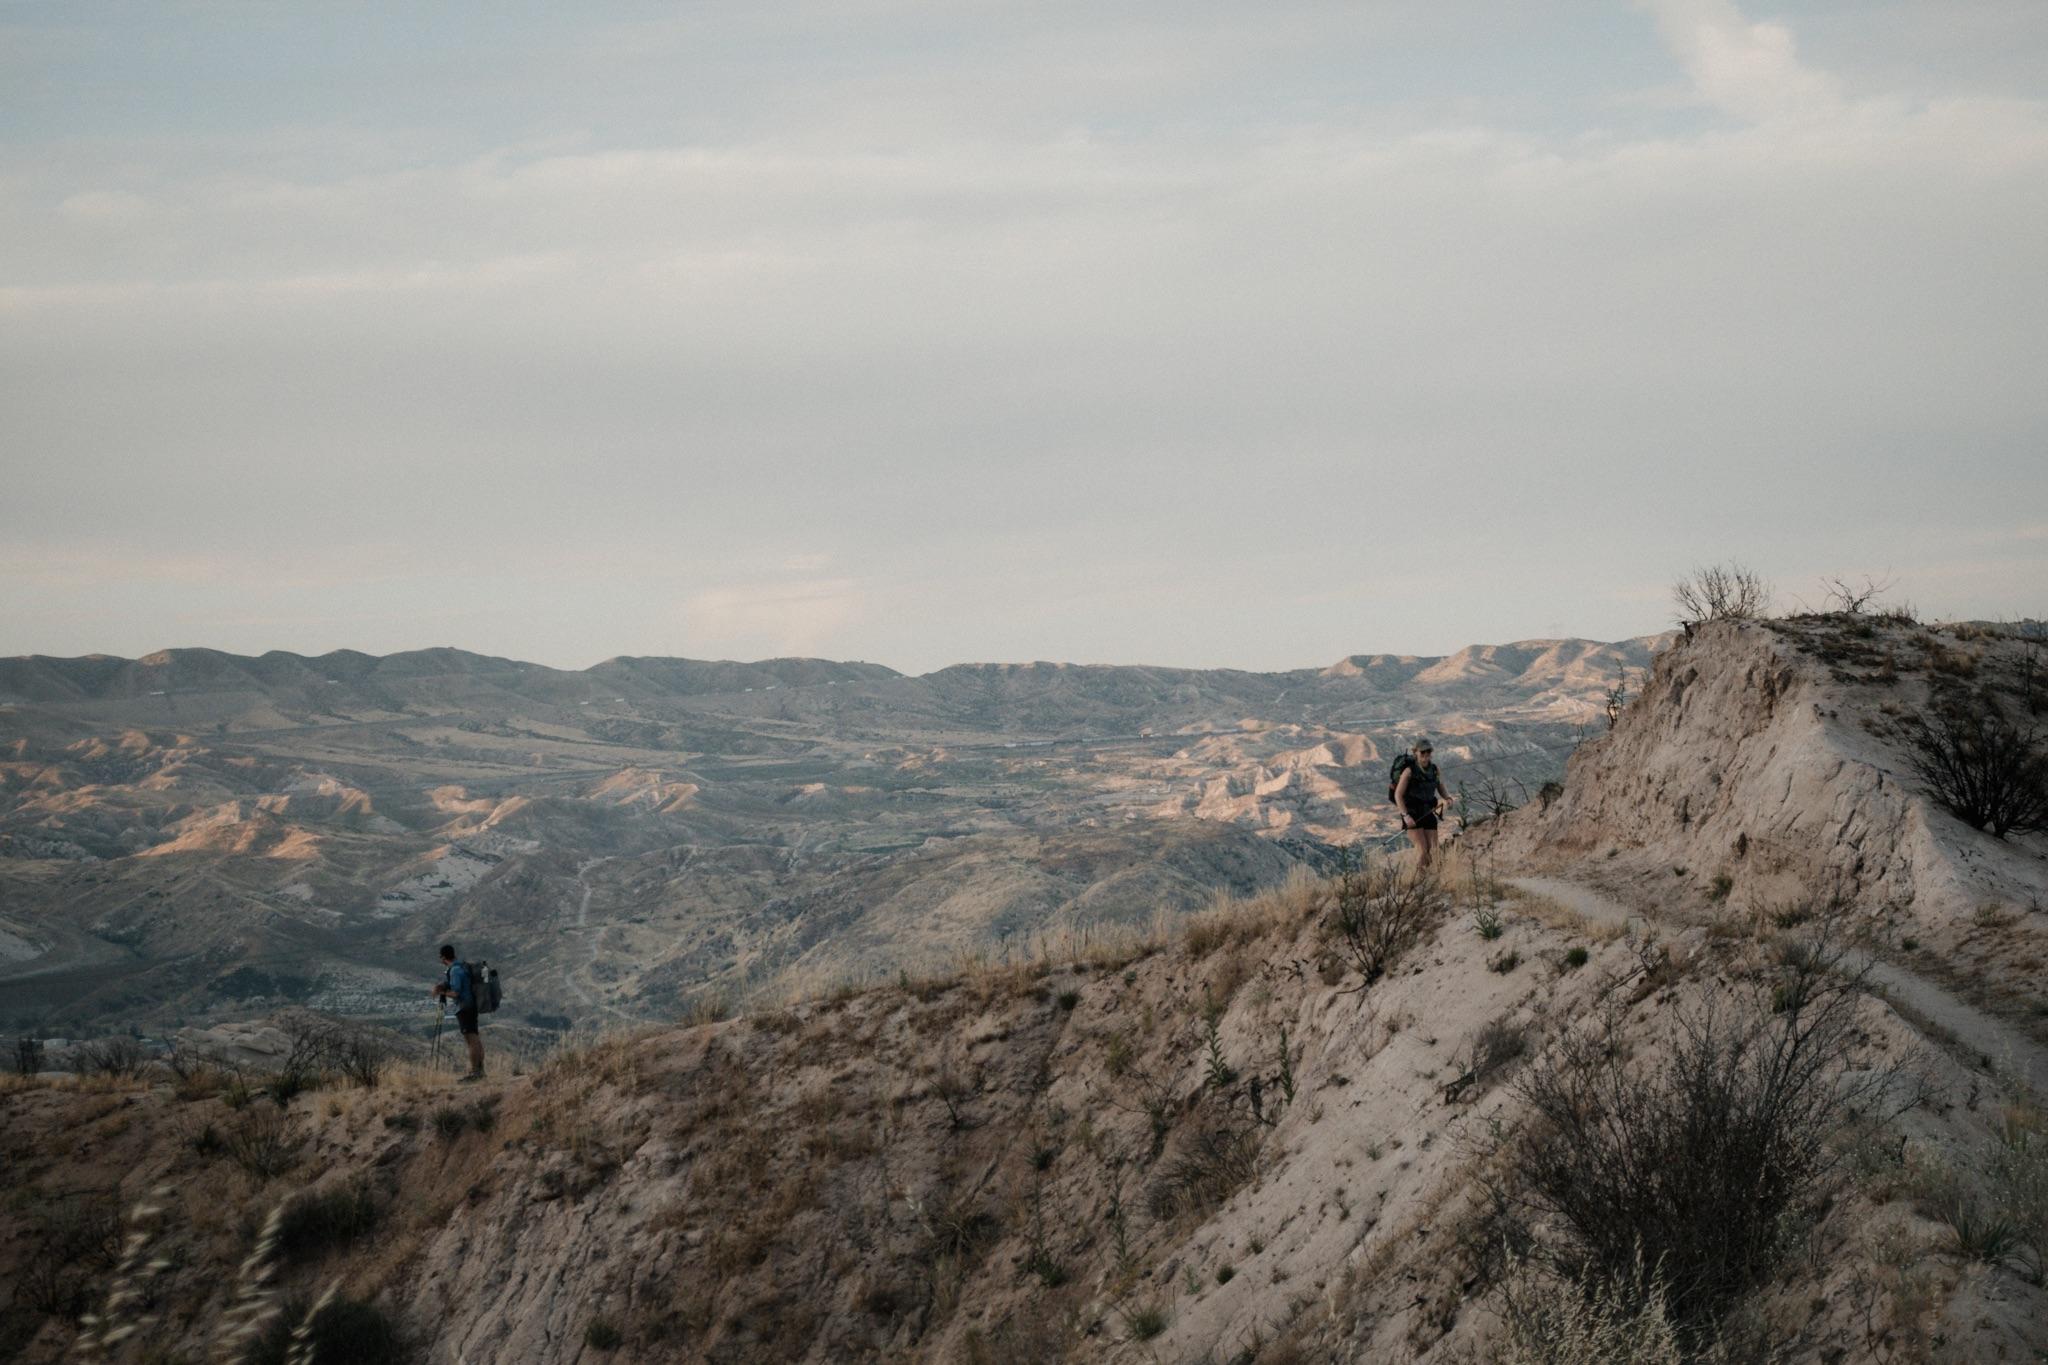 Blis and Sunshine on a ridge line.